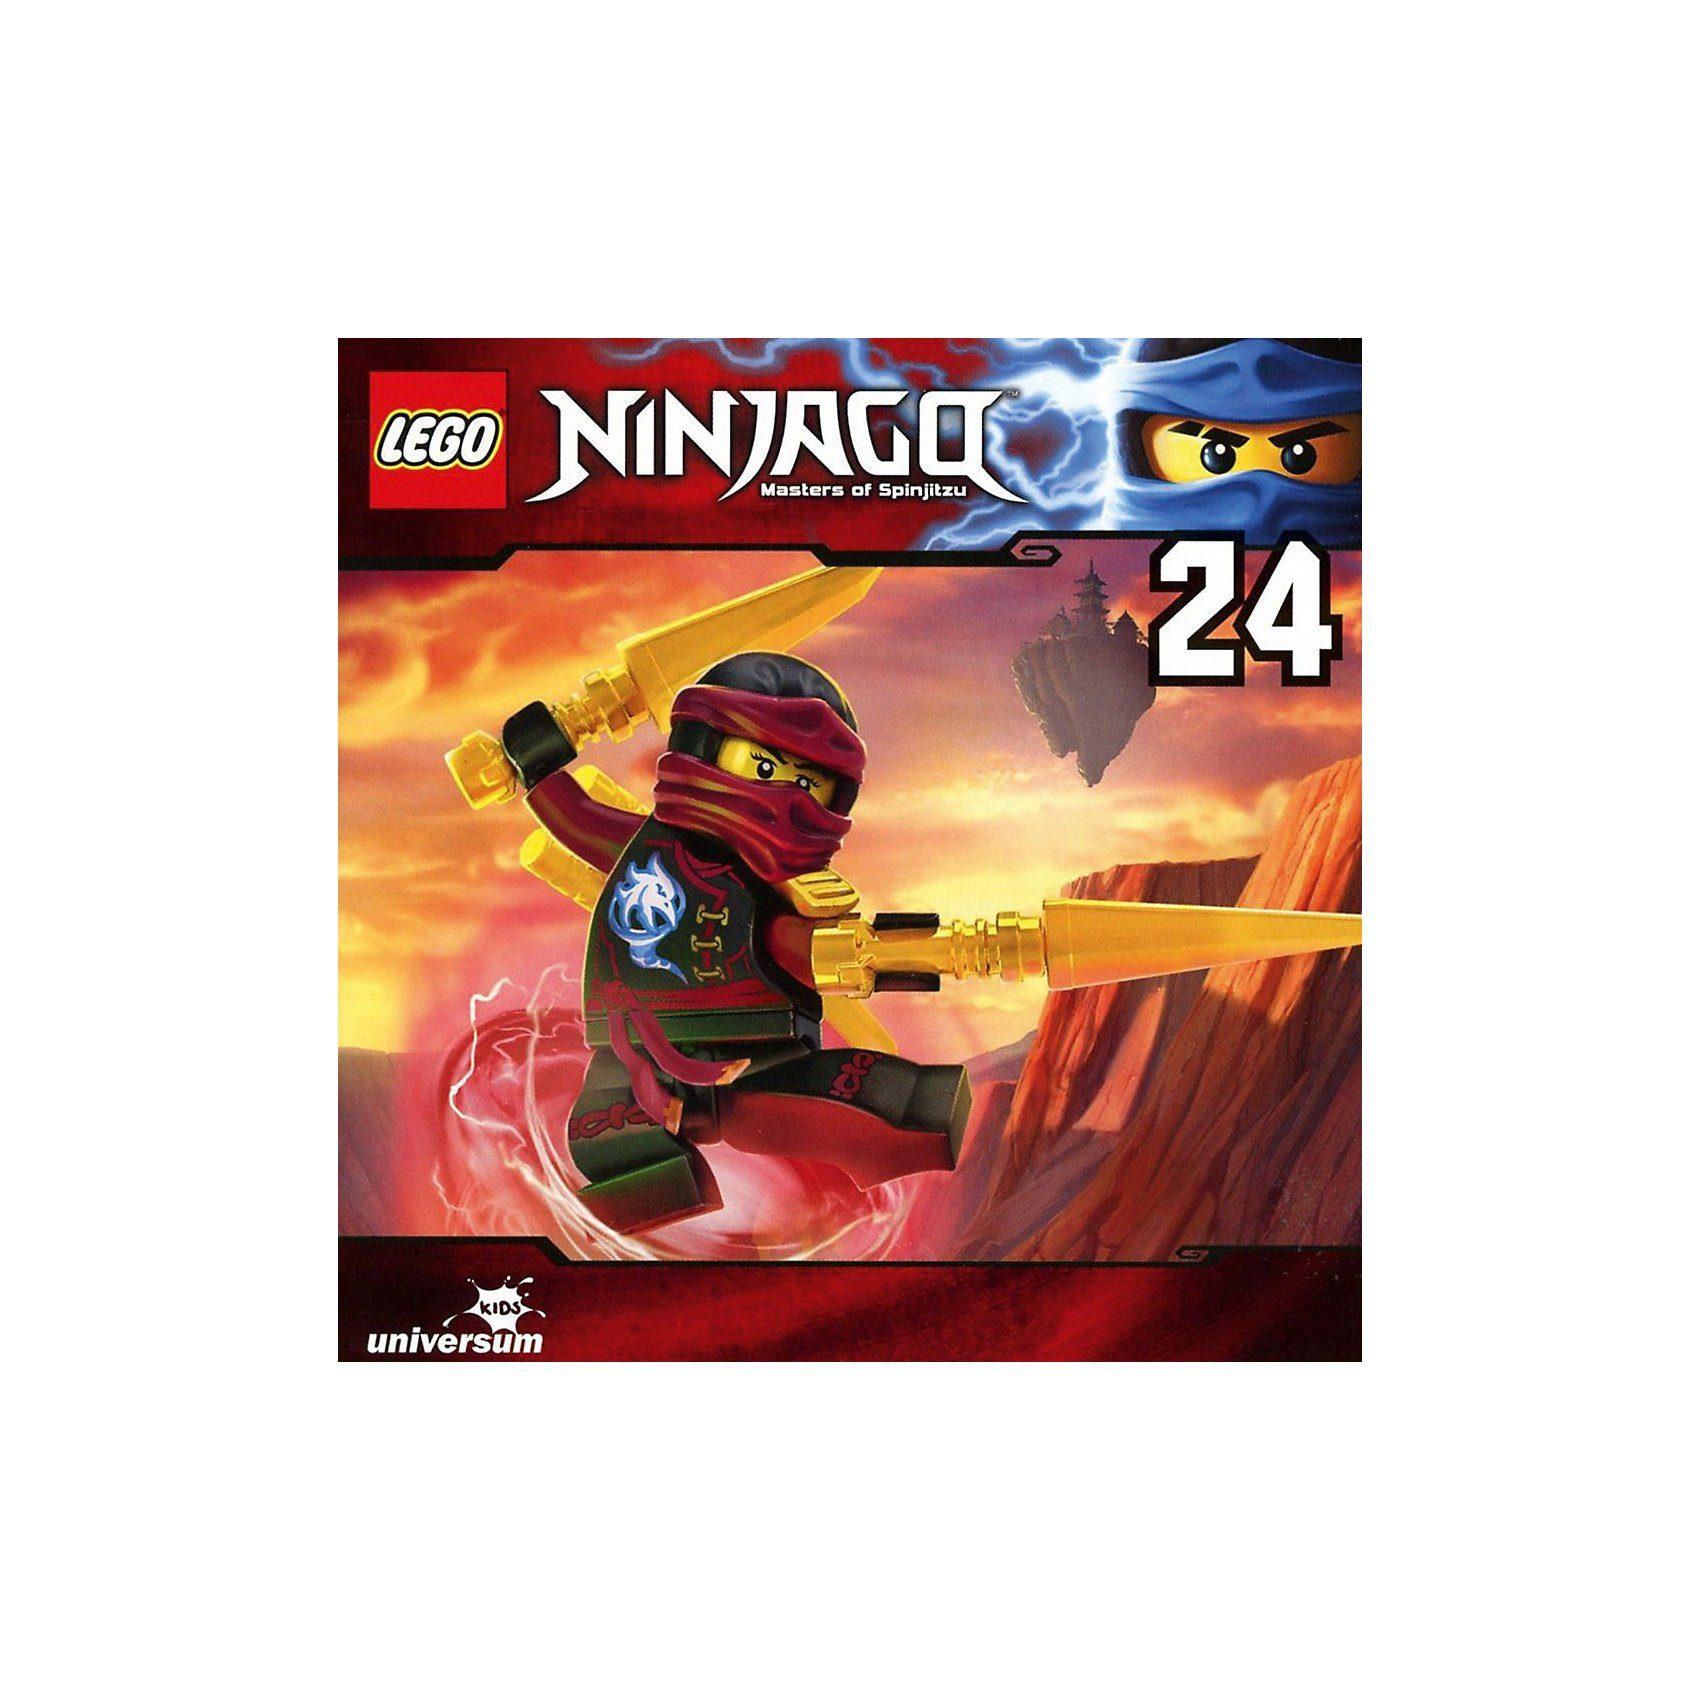 Lego® CD Ninjago - Masters of Spinjitzu 24